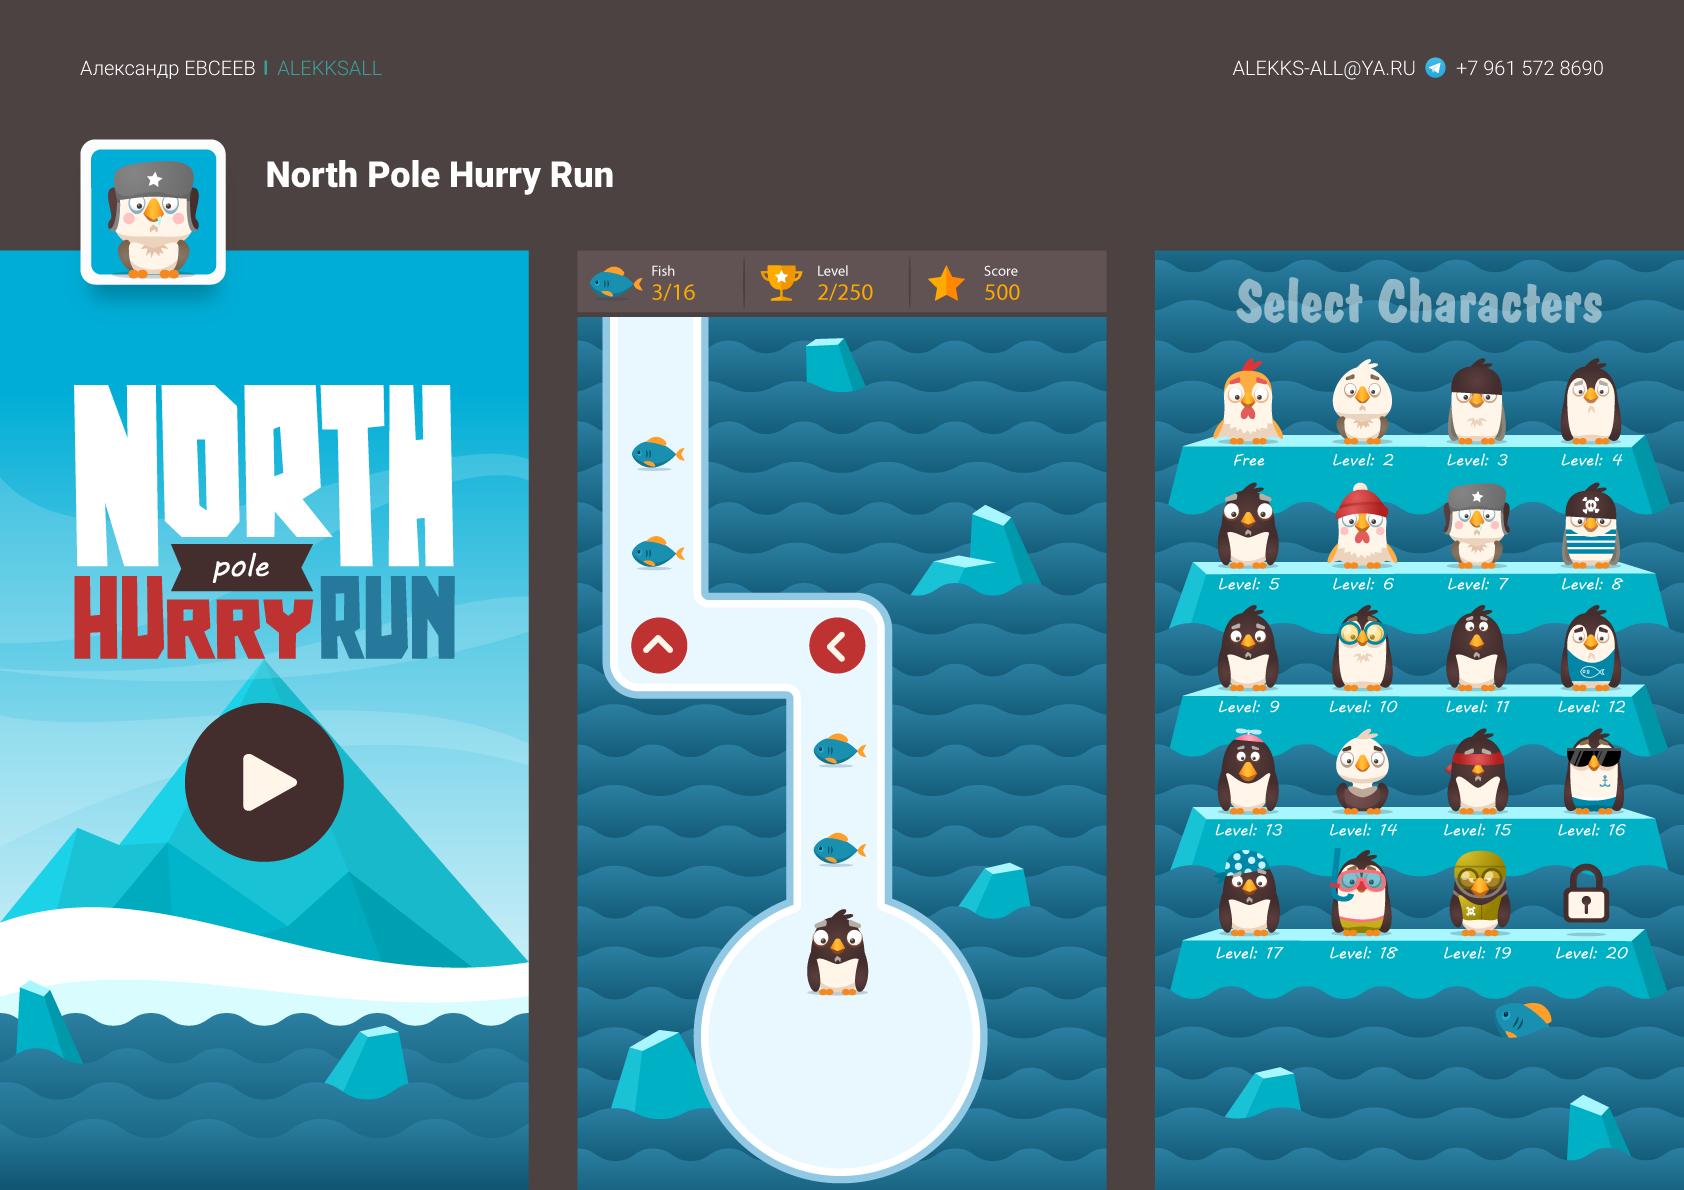 North Pole Hurry Run